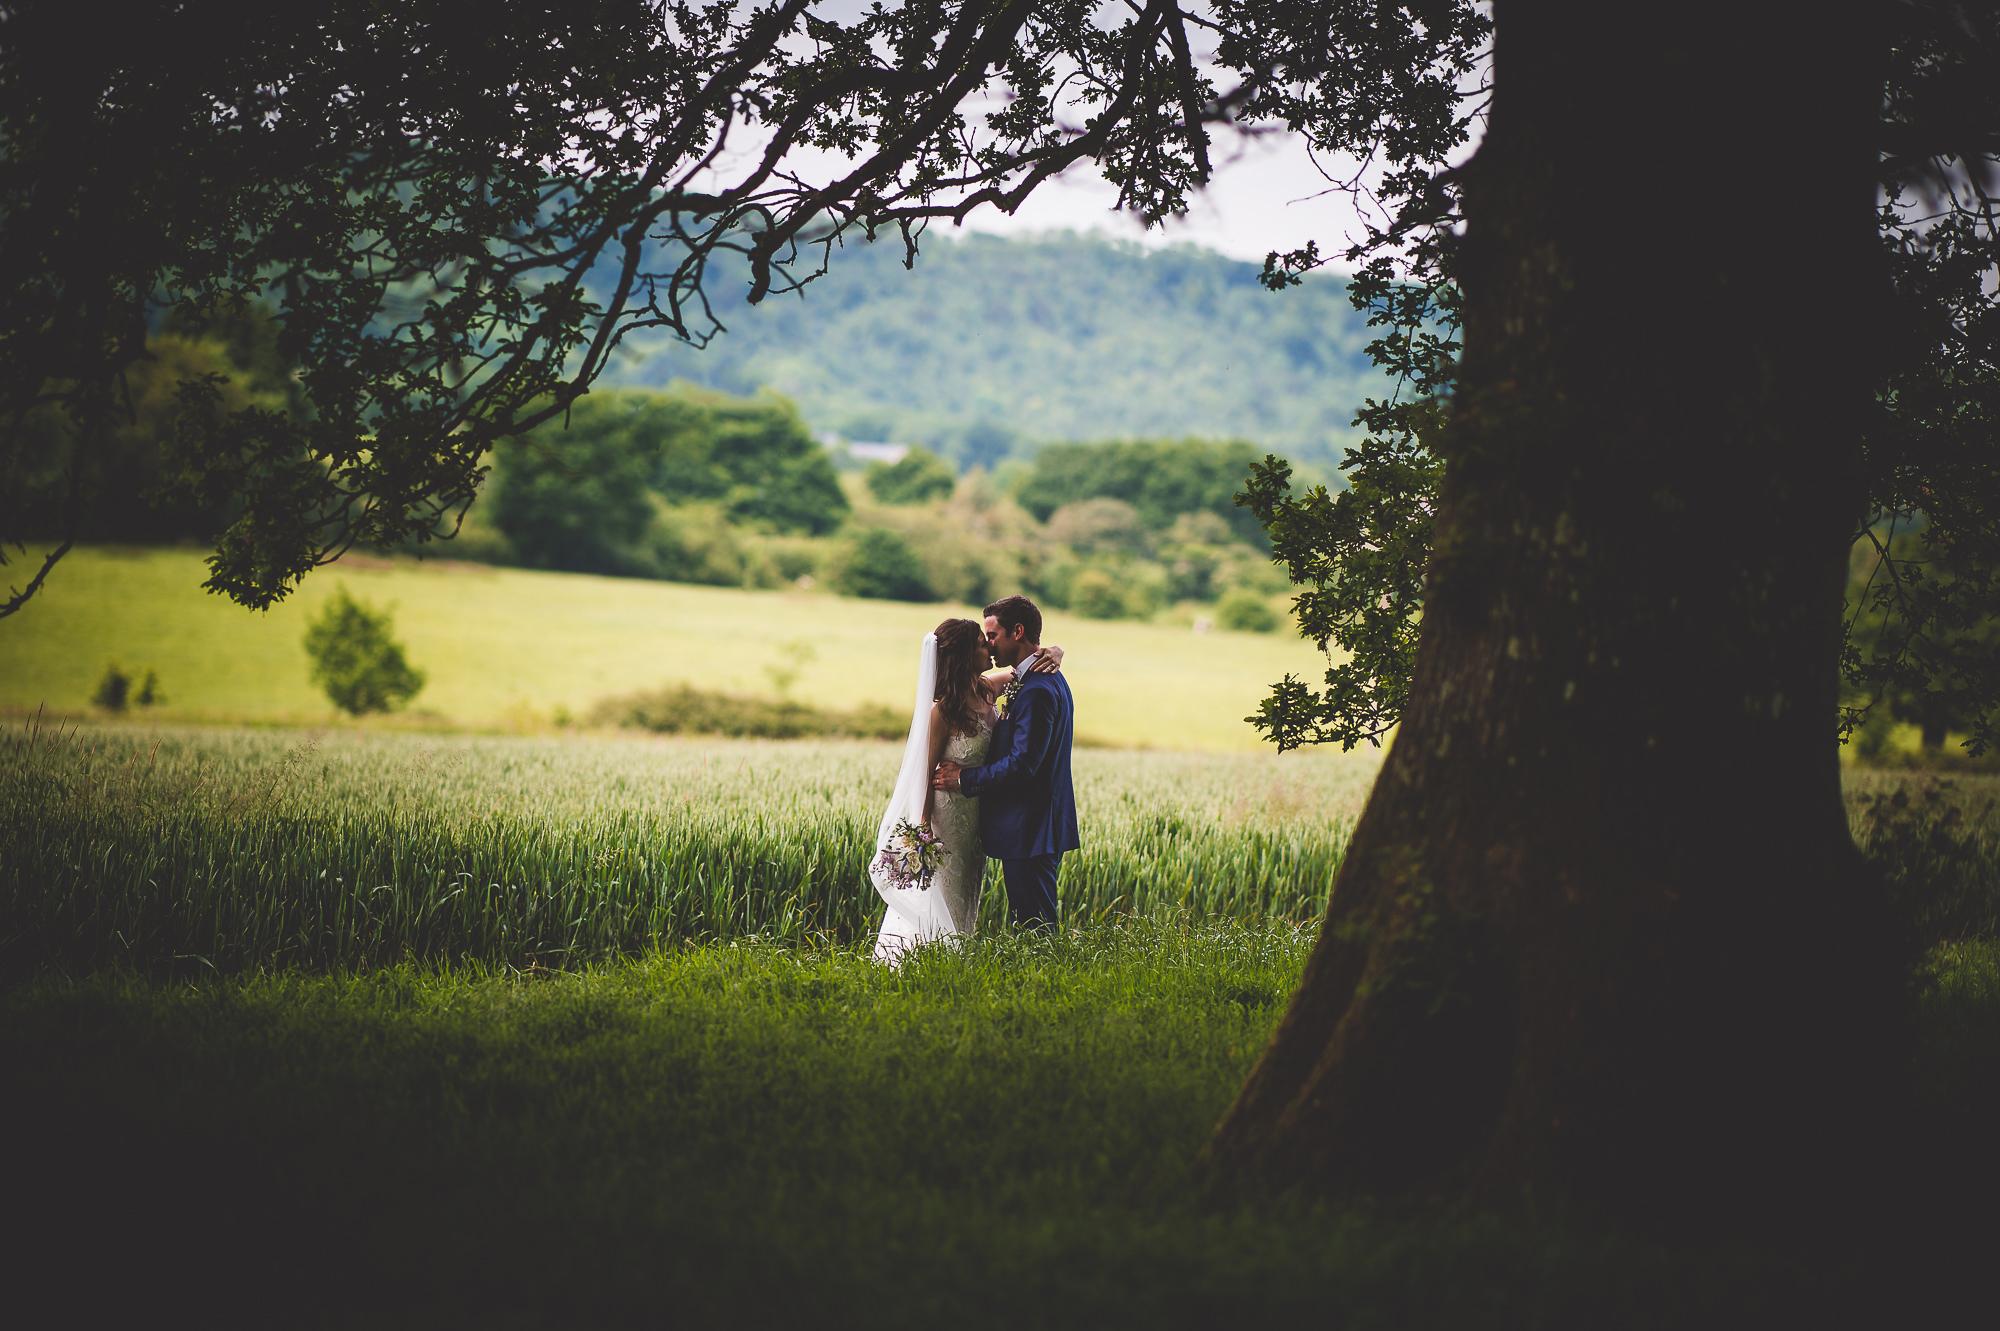 Veils & Bales Wedding Photography | Charlie & Steve SCSS 115